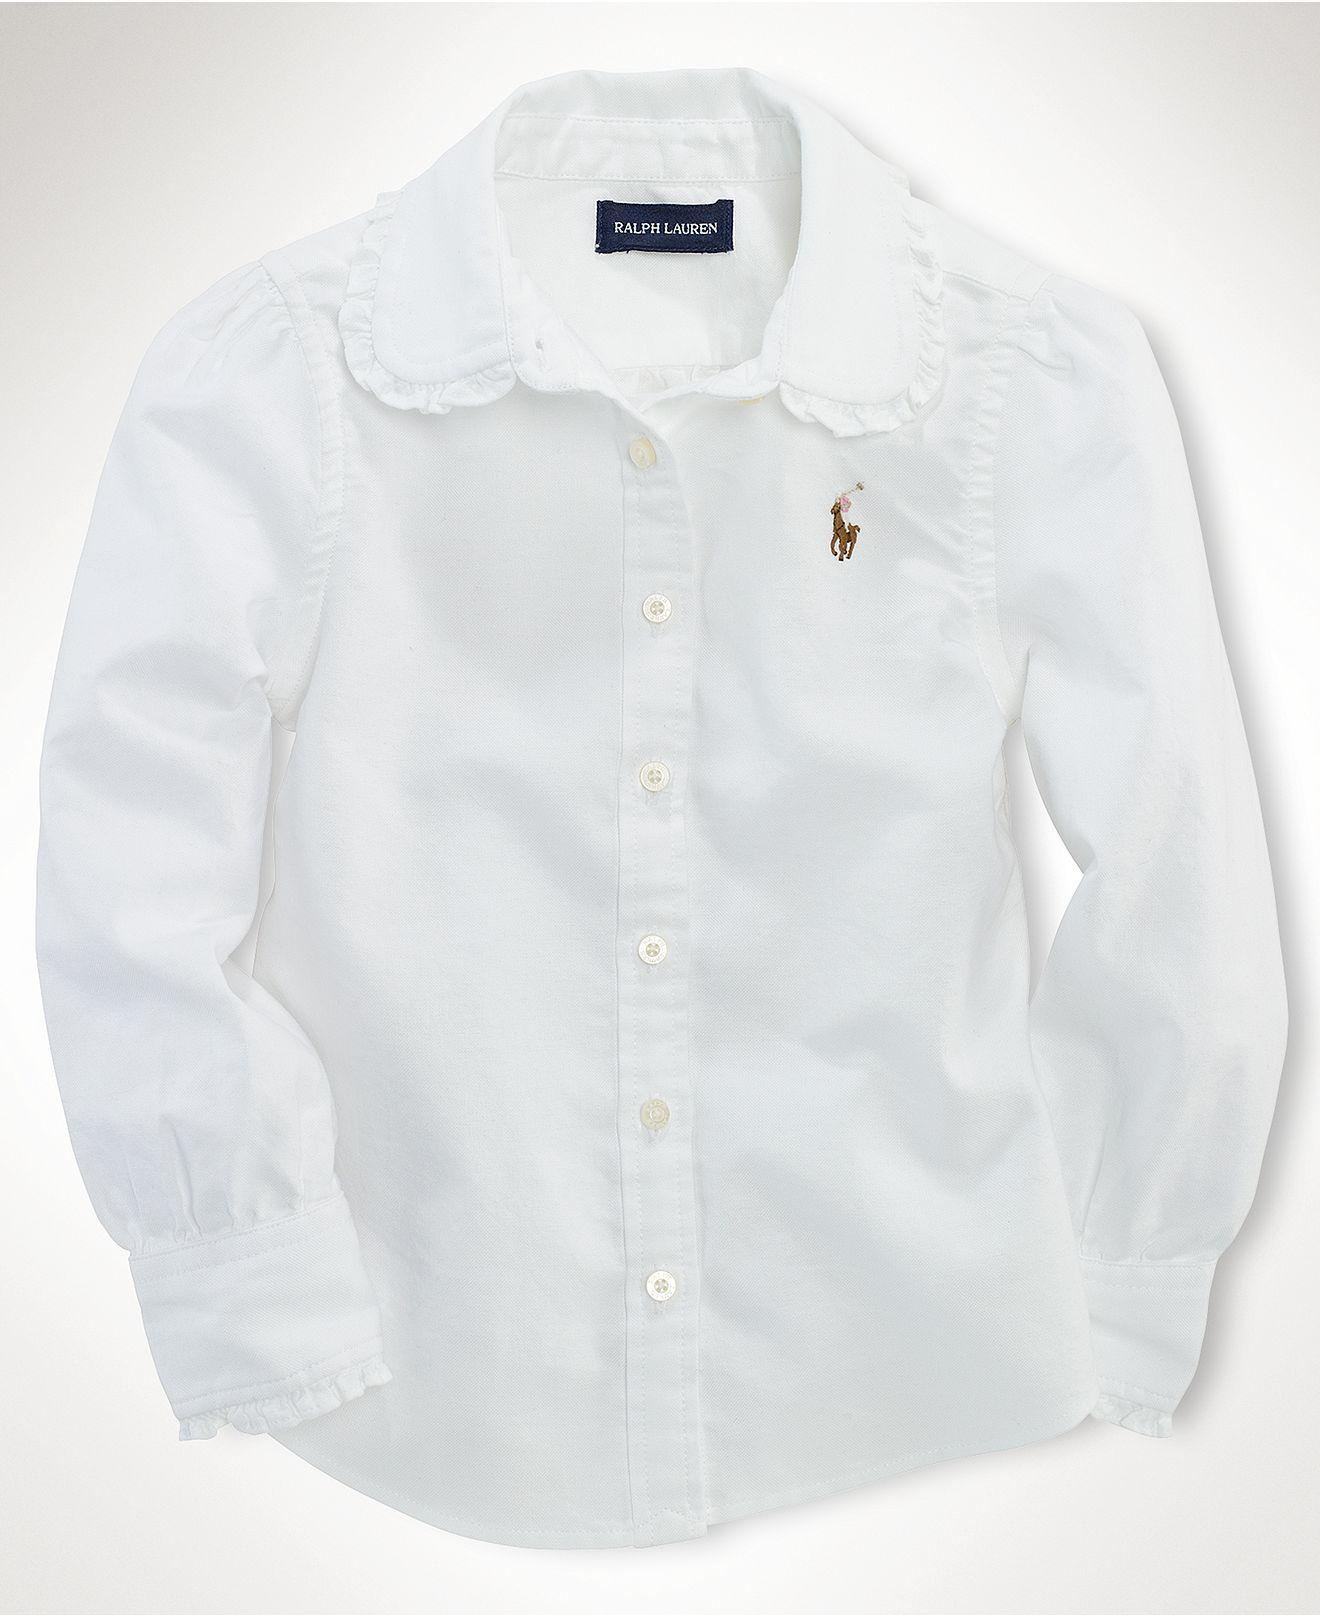 White apron macy's - Classic White Shirt With Just A Hint Of Ruffle Ralph Lauren Kids Shirt Little